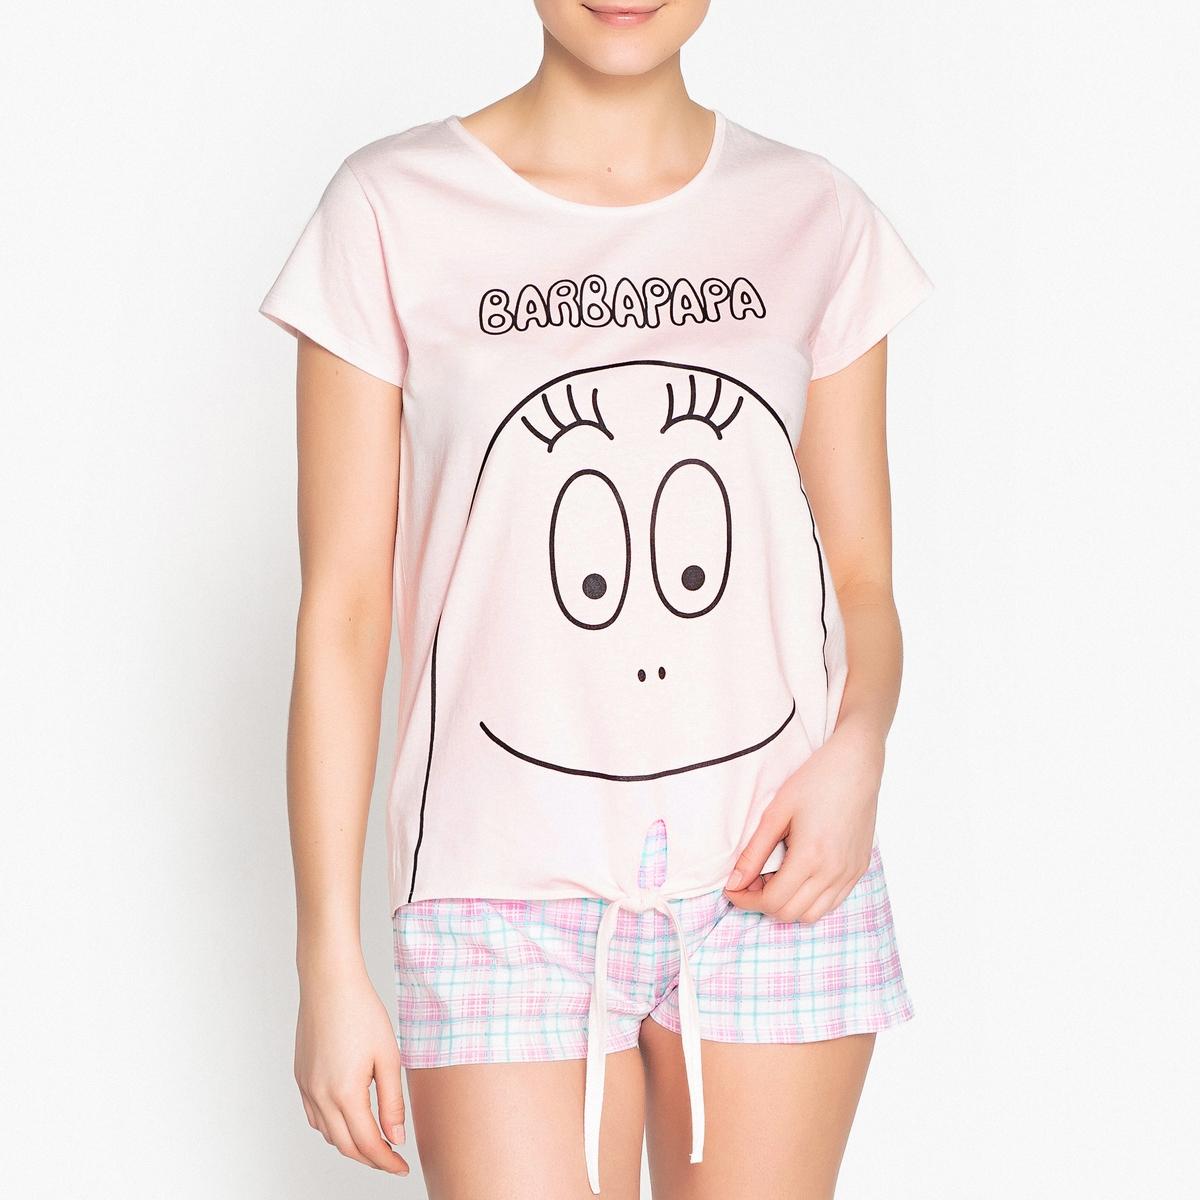 Пижама из хлопка с рисунком Barbapapa